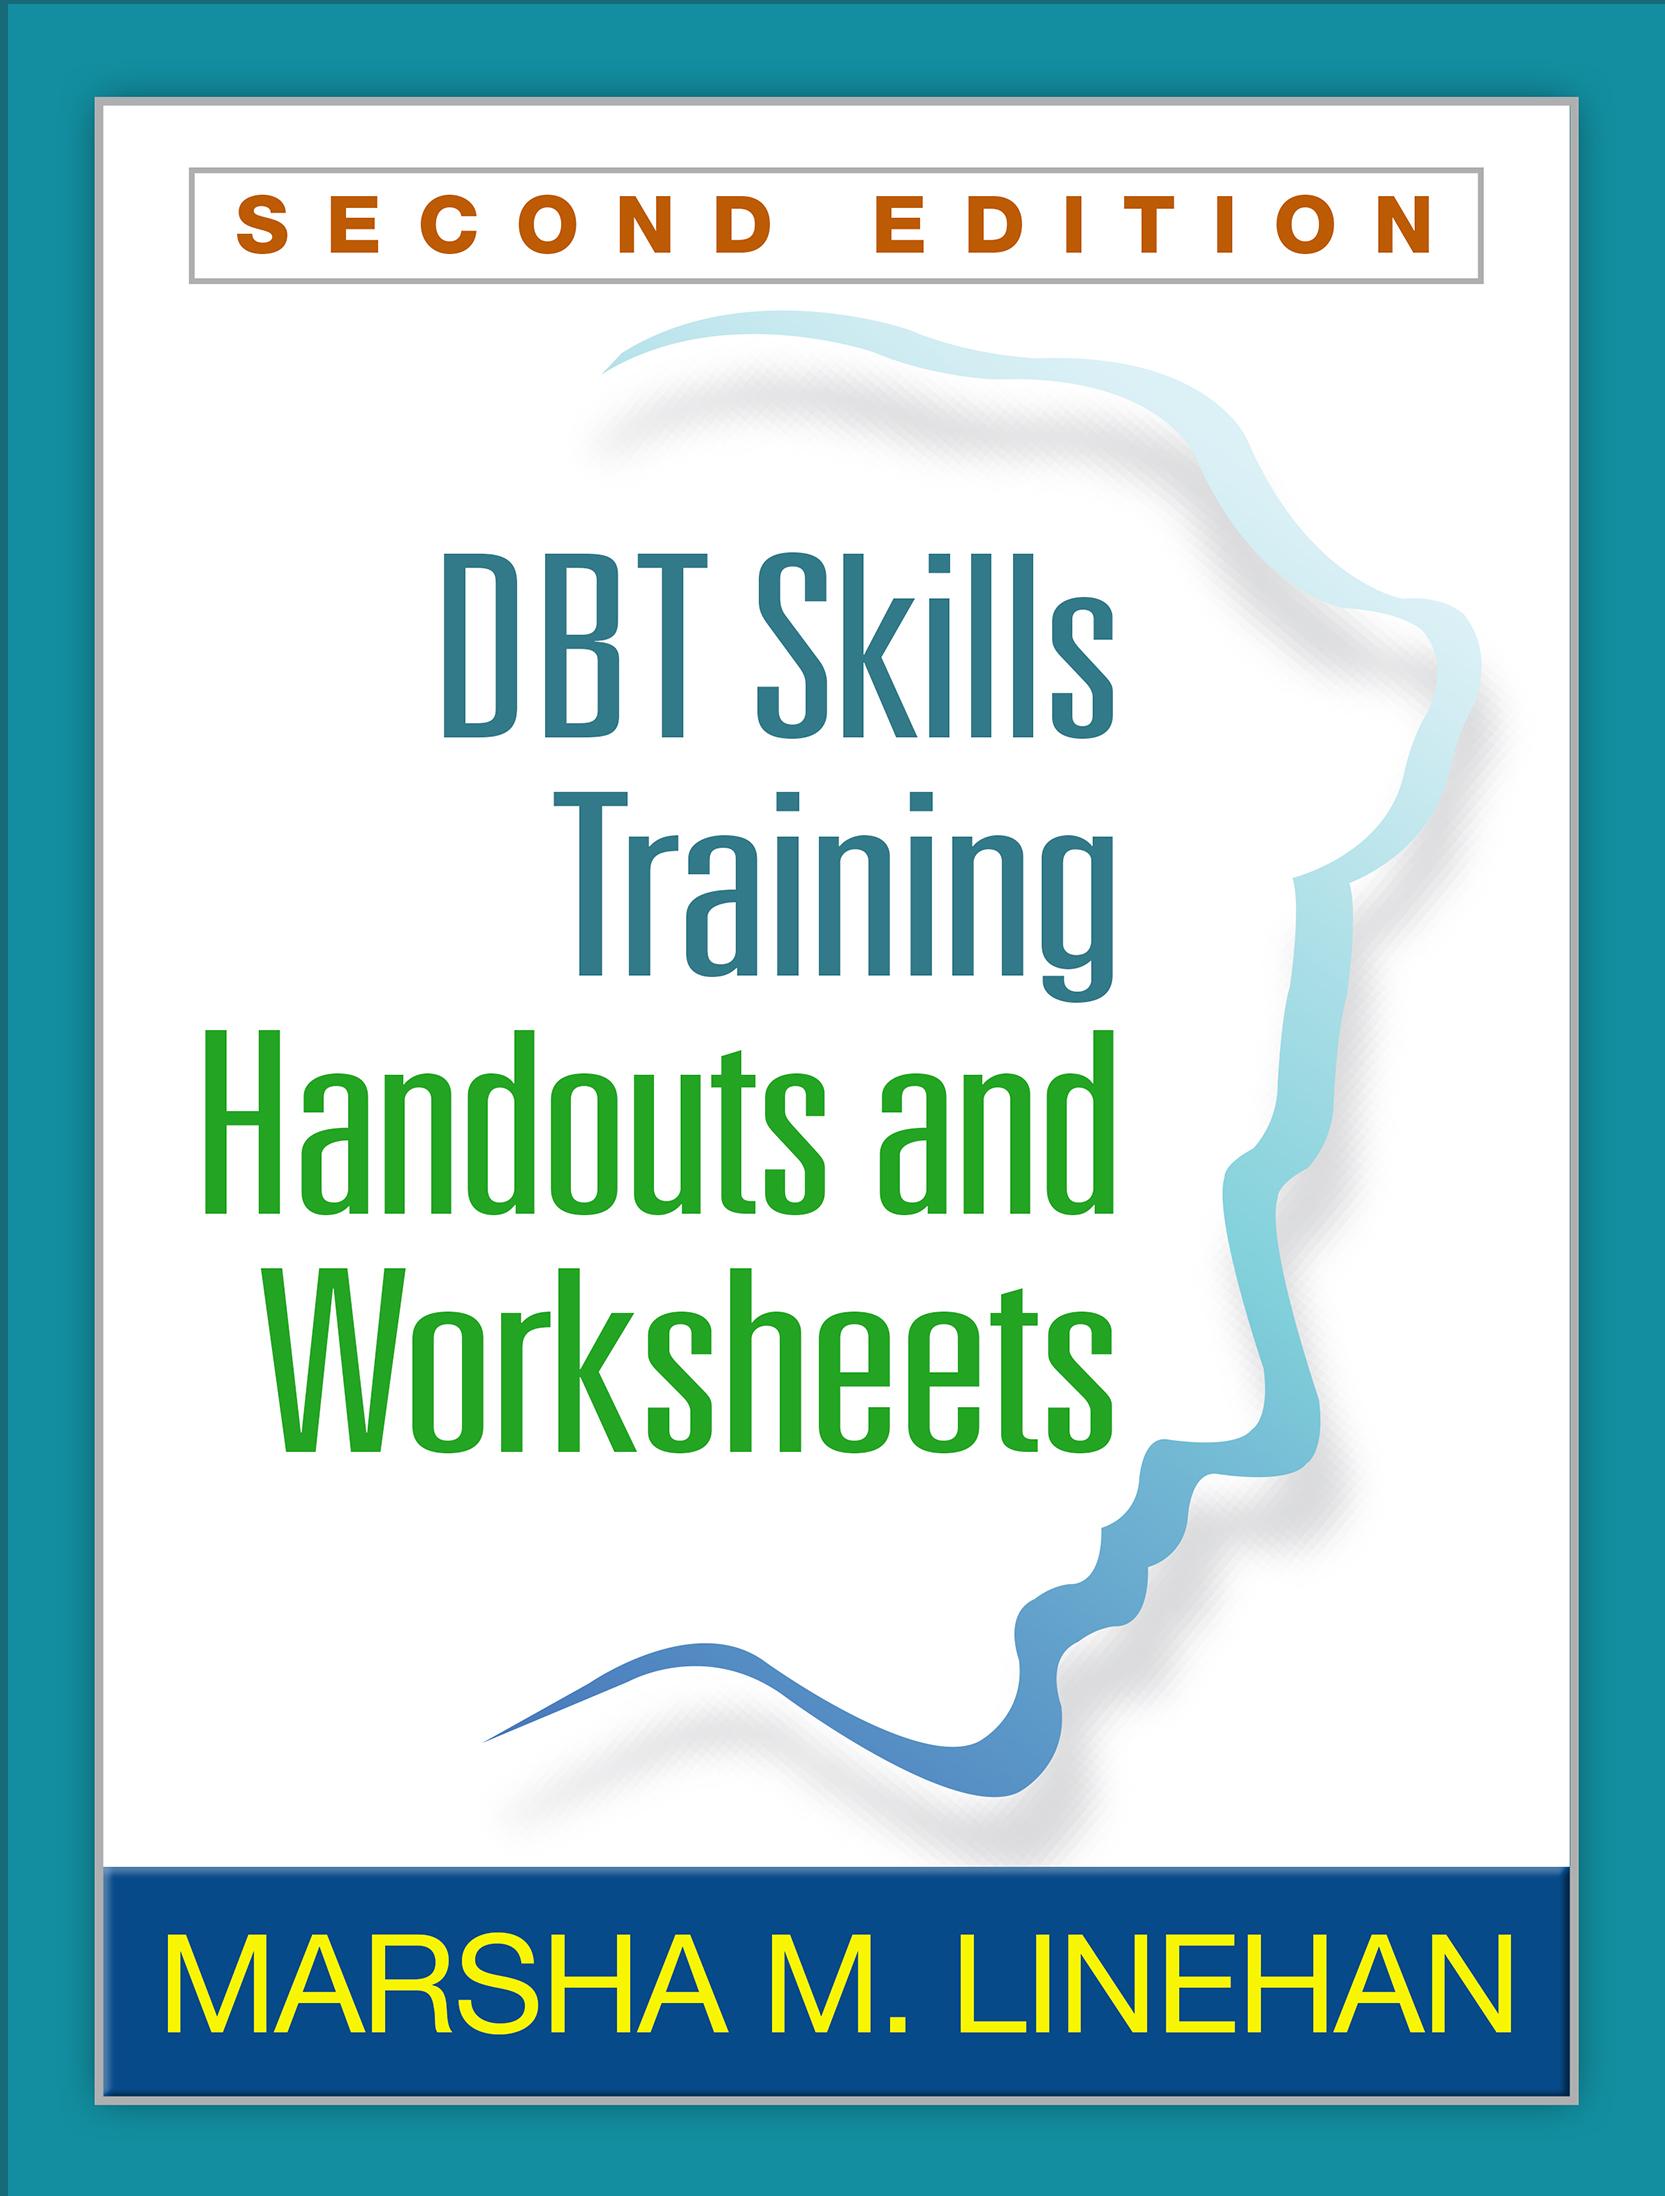 Dbt Treatment Developer Dr Marsha Linehan Releases New Edition Of Bestselling Skills Manual